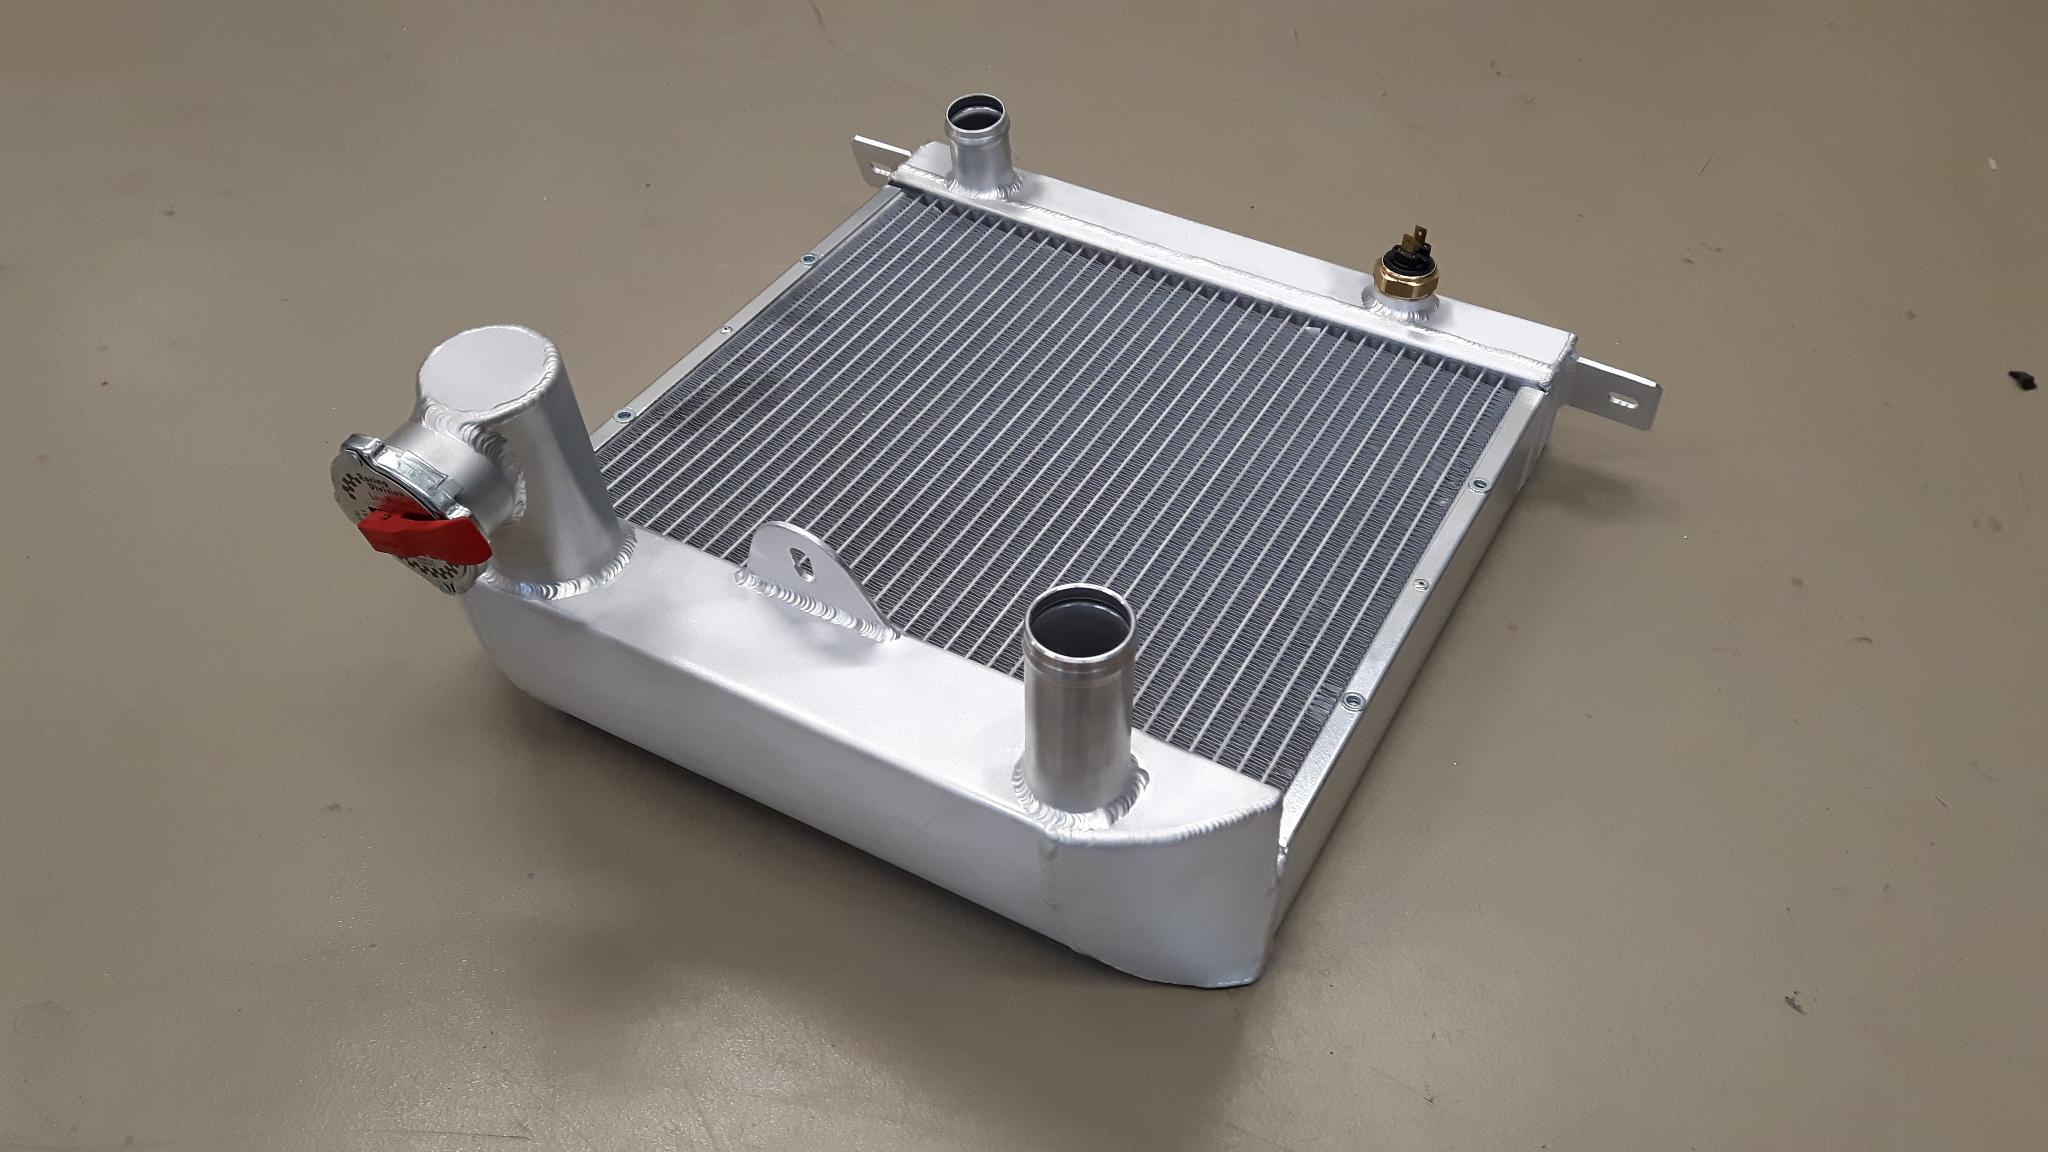 Radiateur speciaal Morgan Sportscar ( fiat motor) !!!!-0